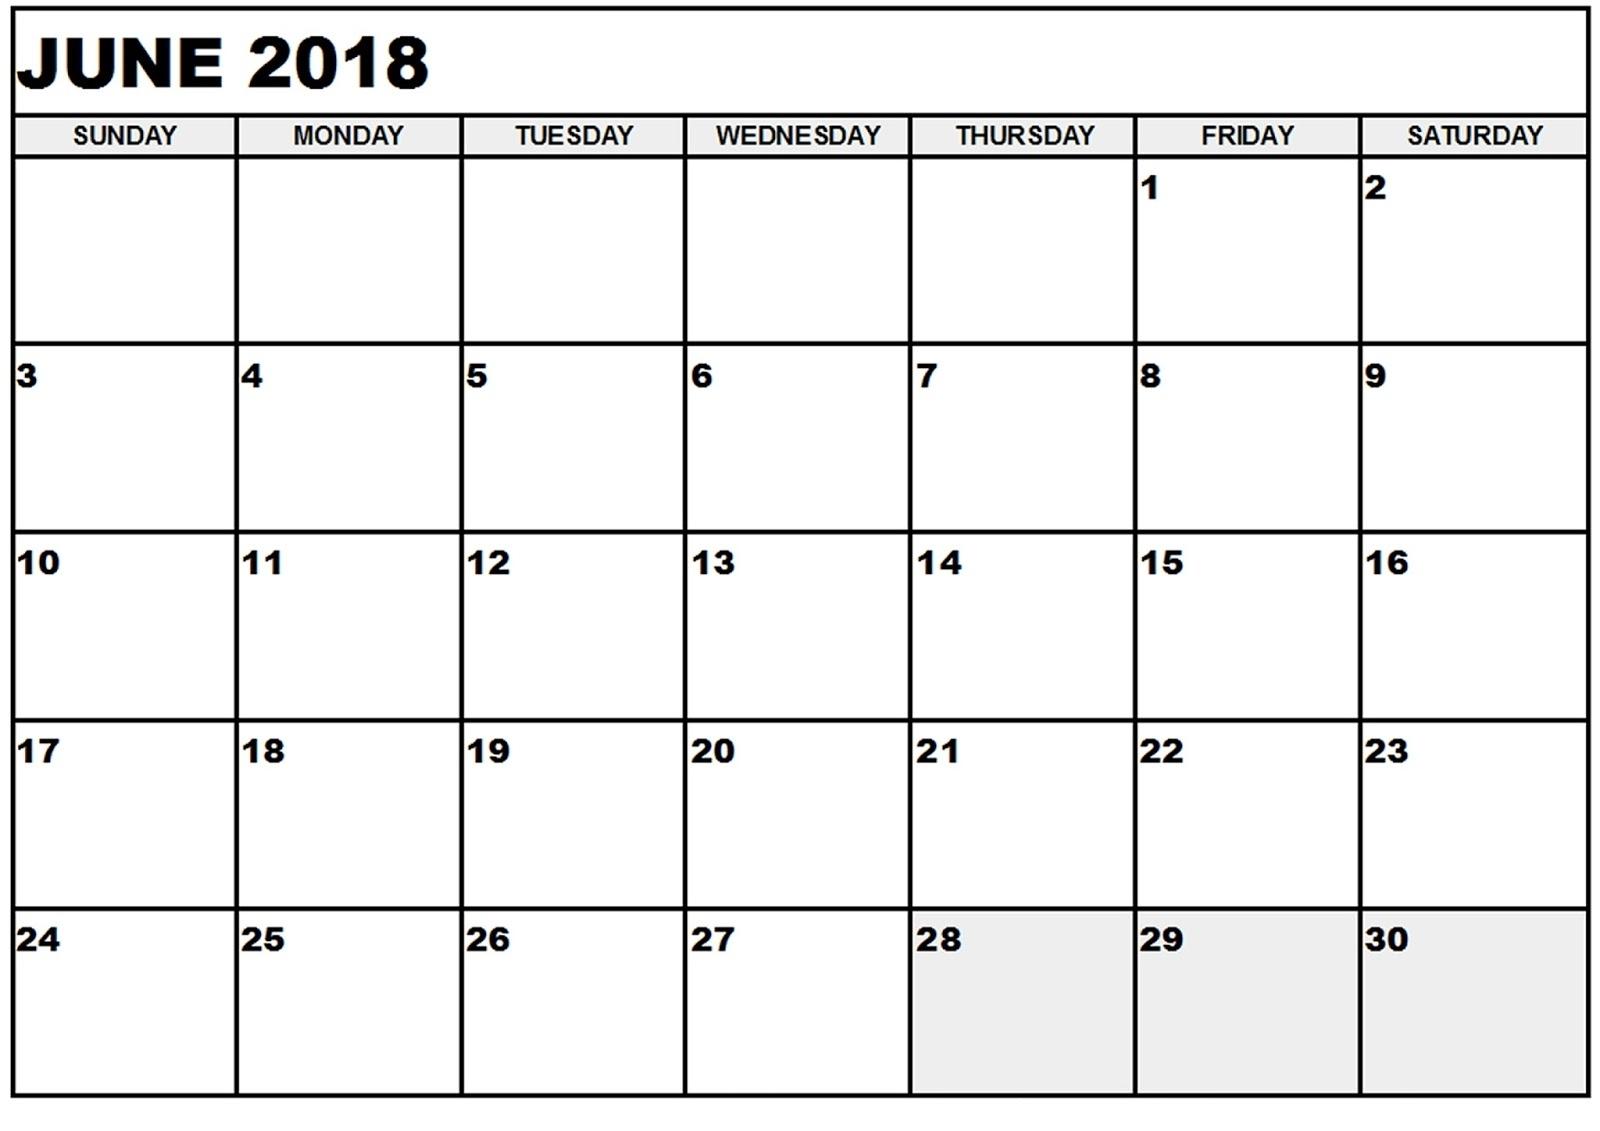 June 2018 Calendar Printable Templates - Calendar Office